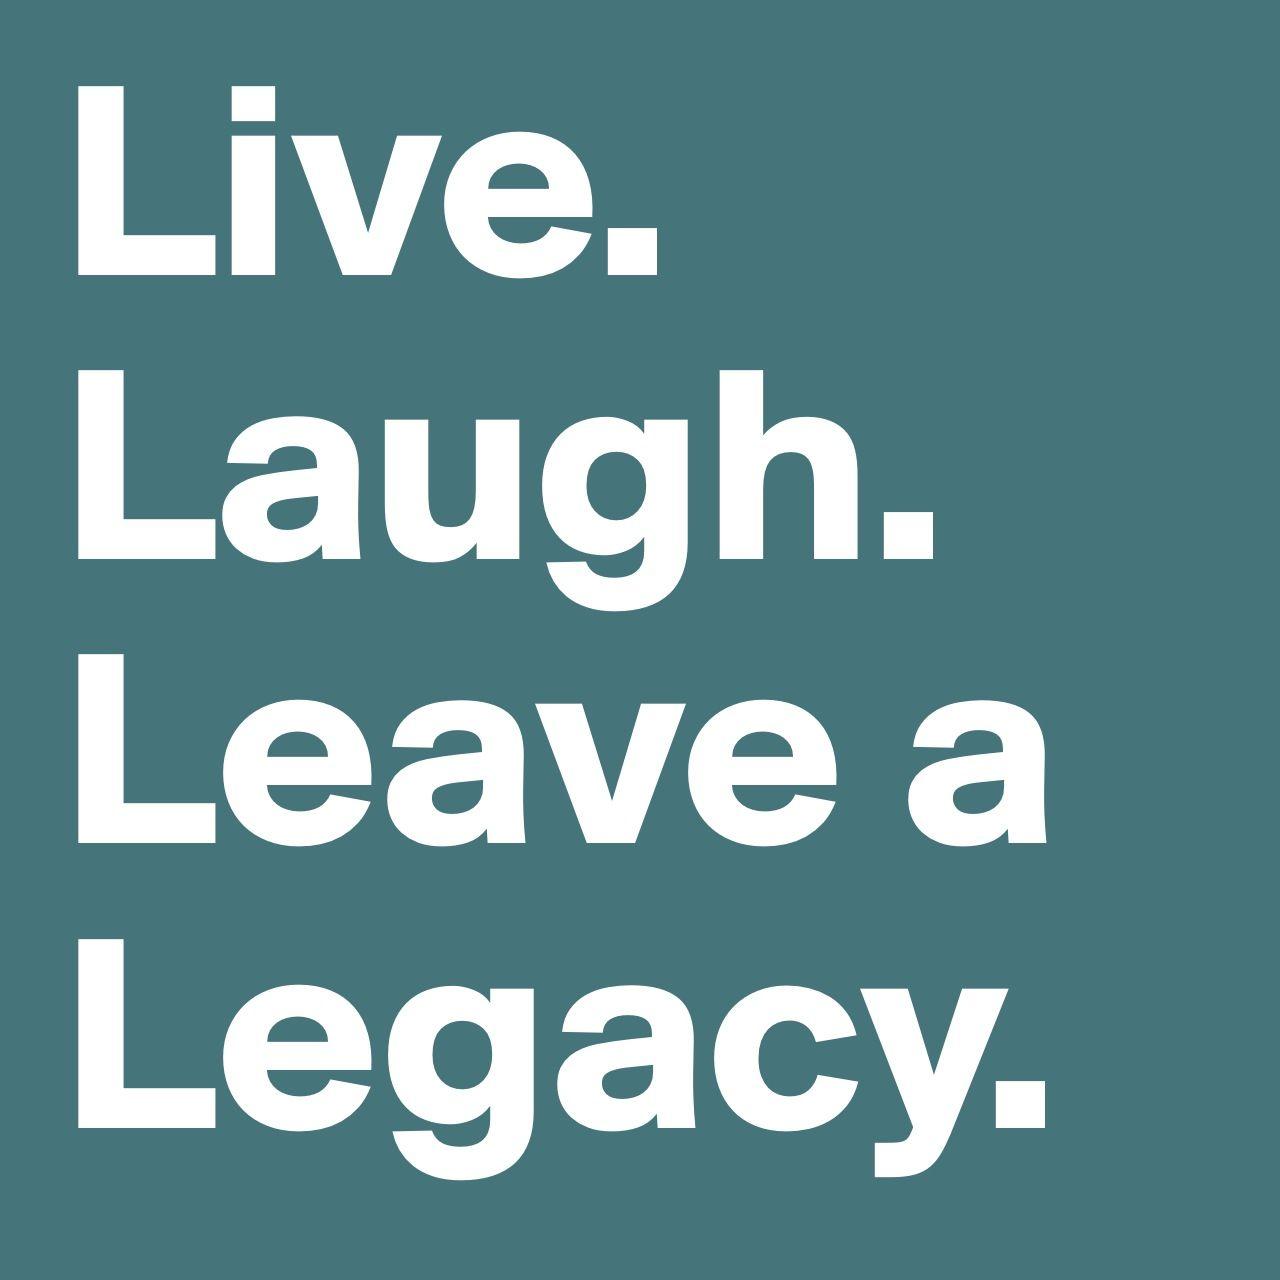 Live. Laugh. Leave a legacy. Steven Covey. Business